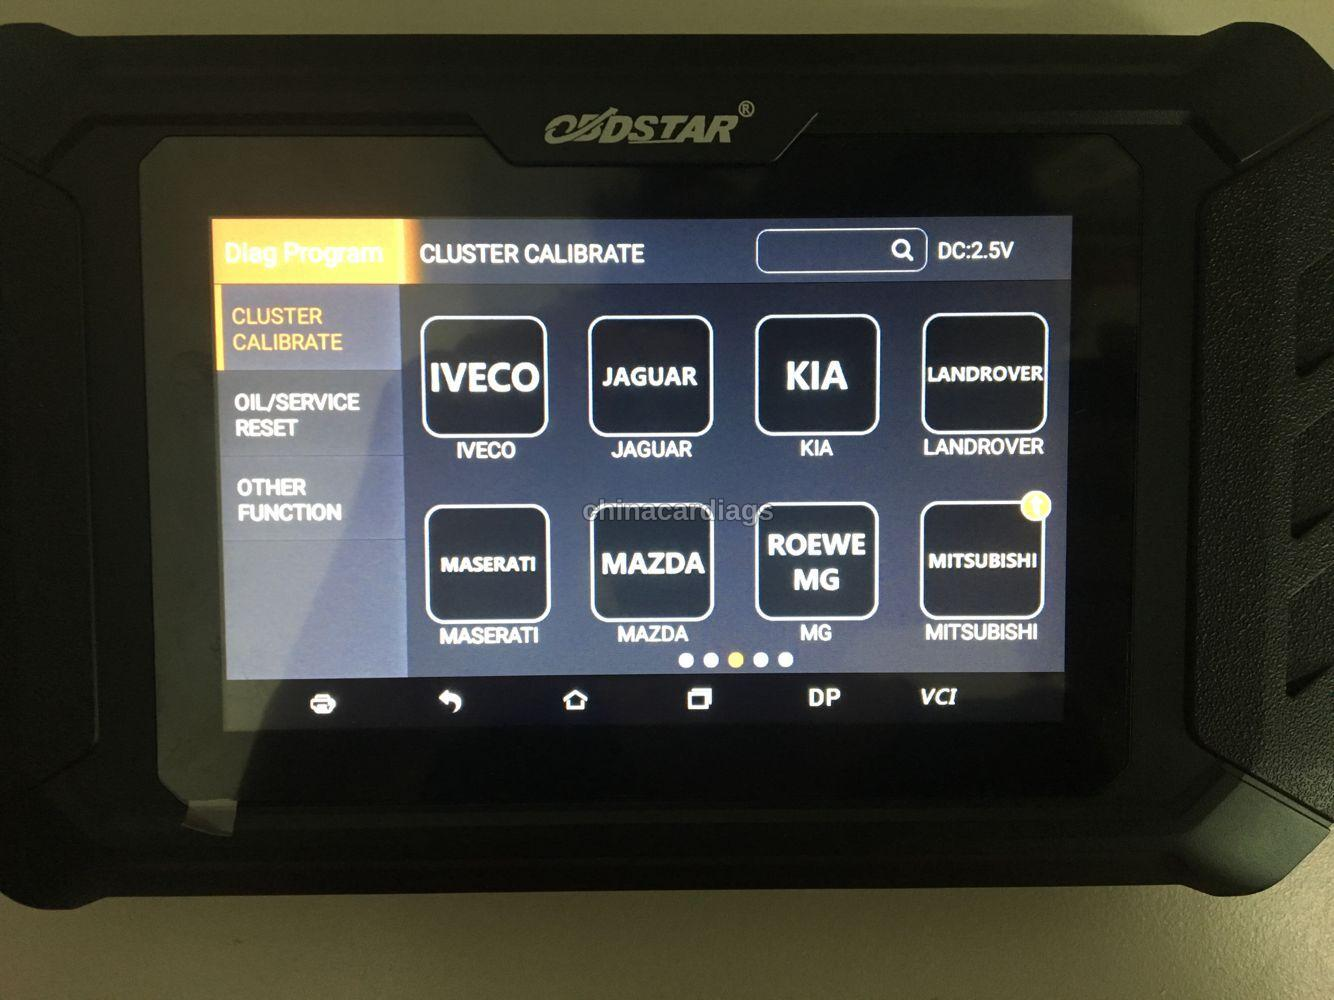 OBDSTAR-OdoMaster-car-list-4